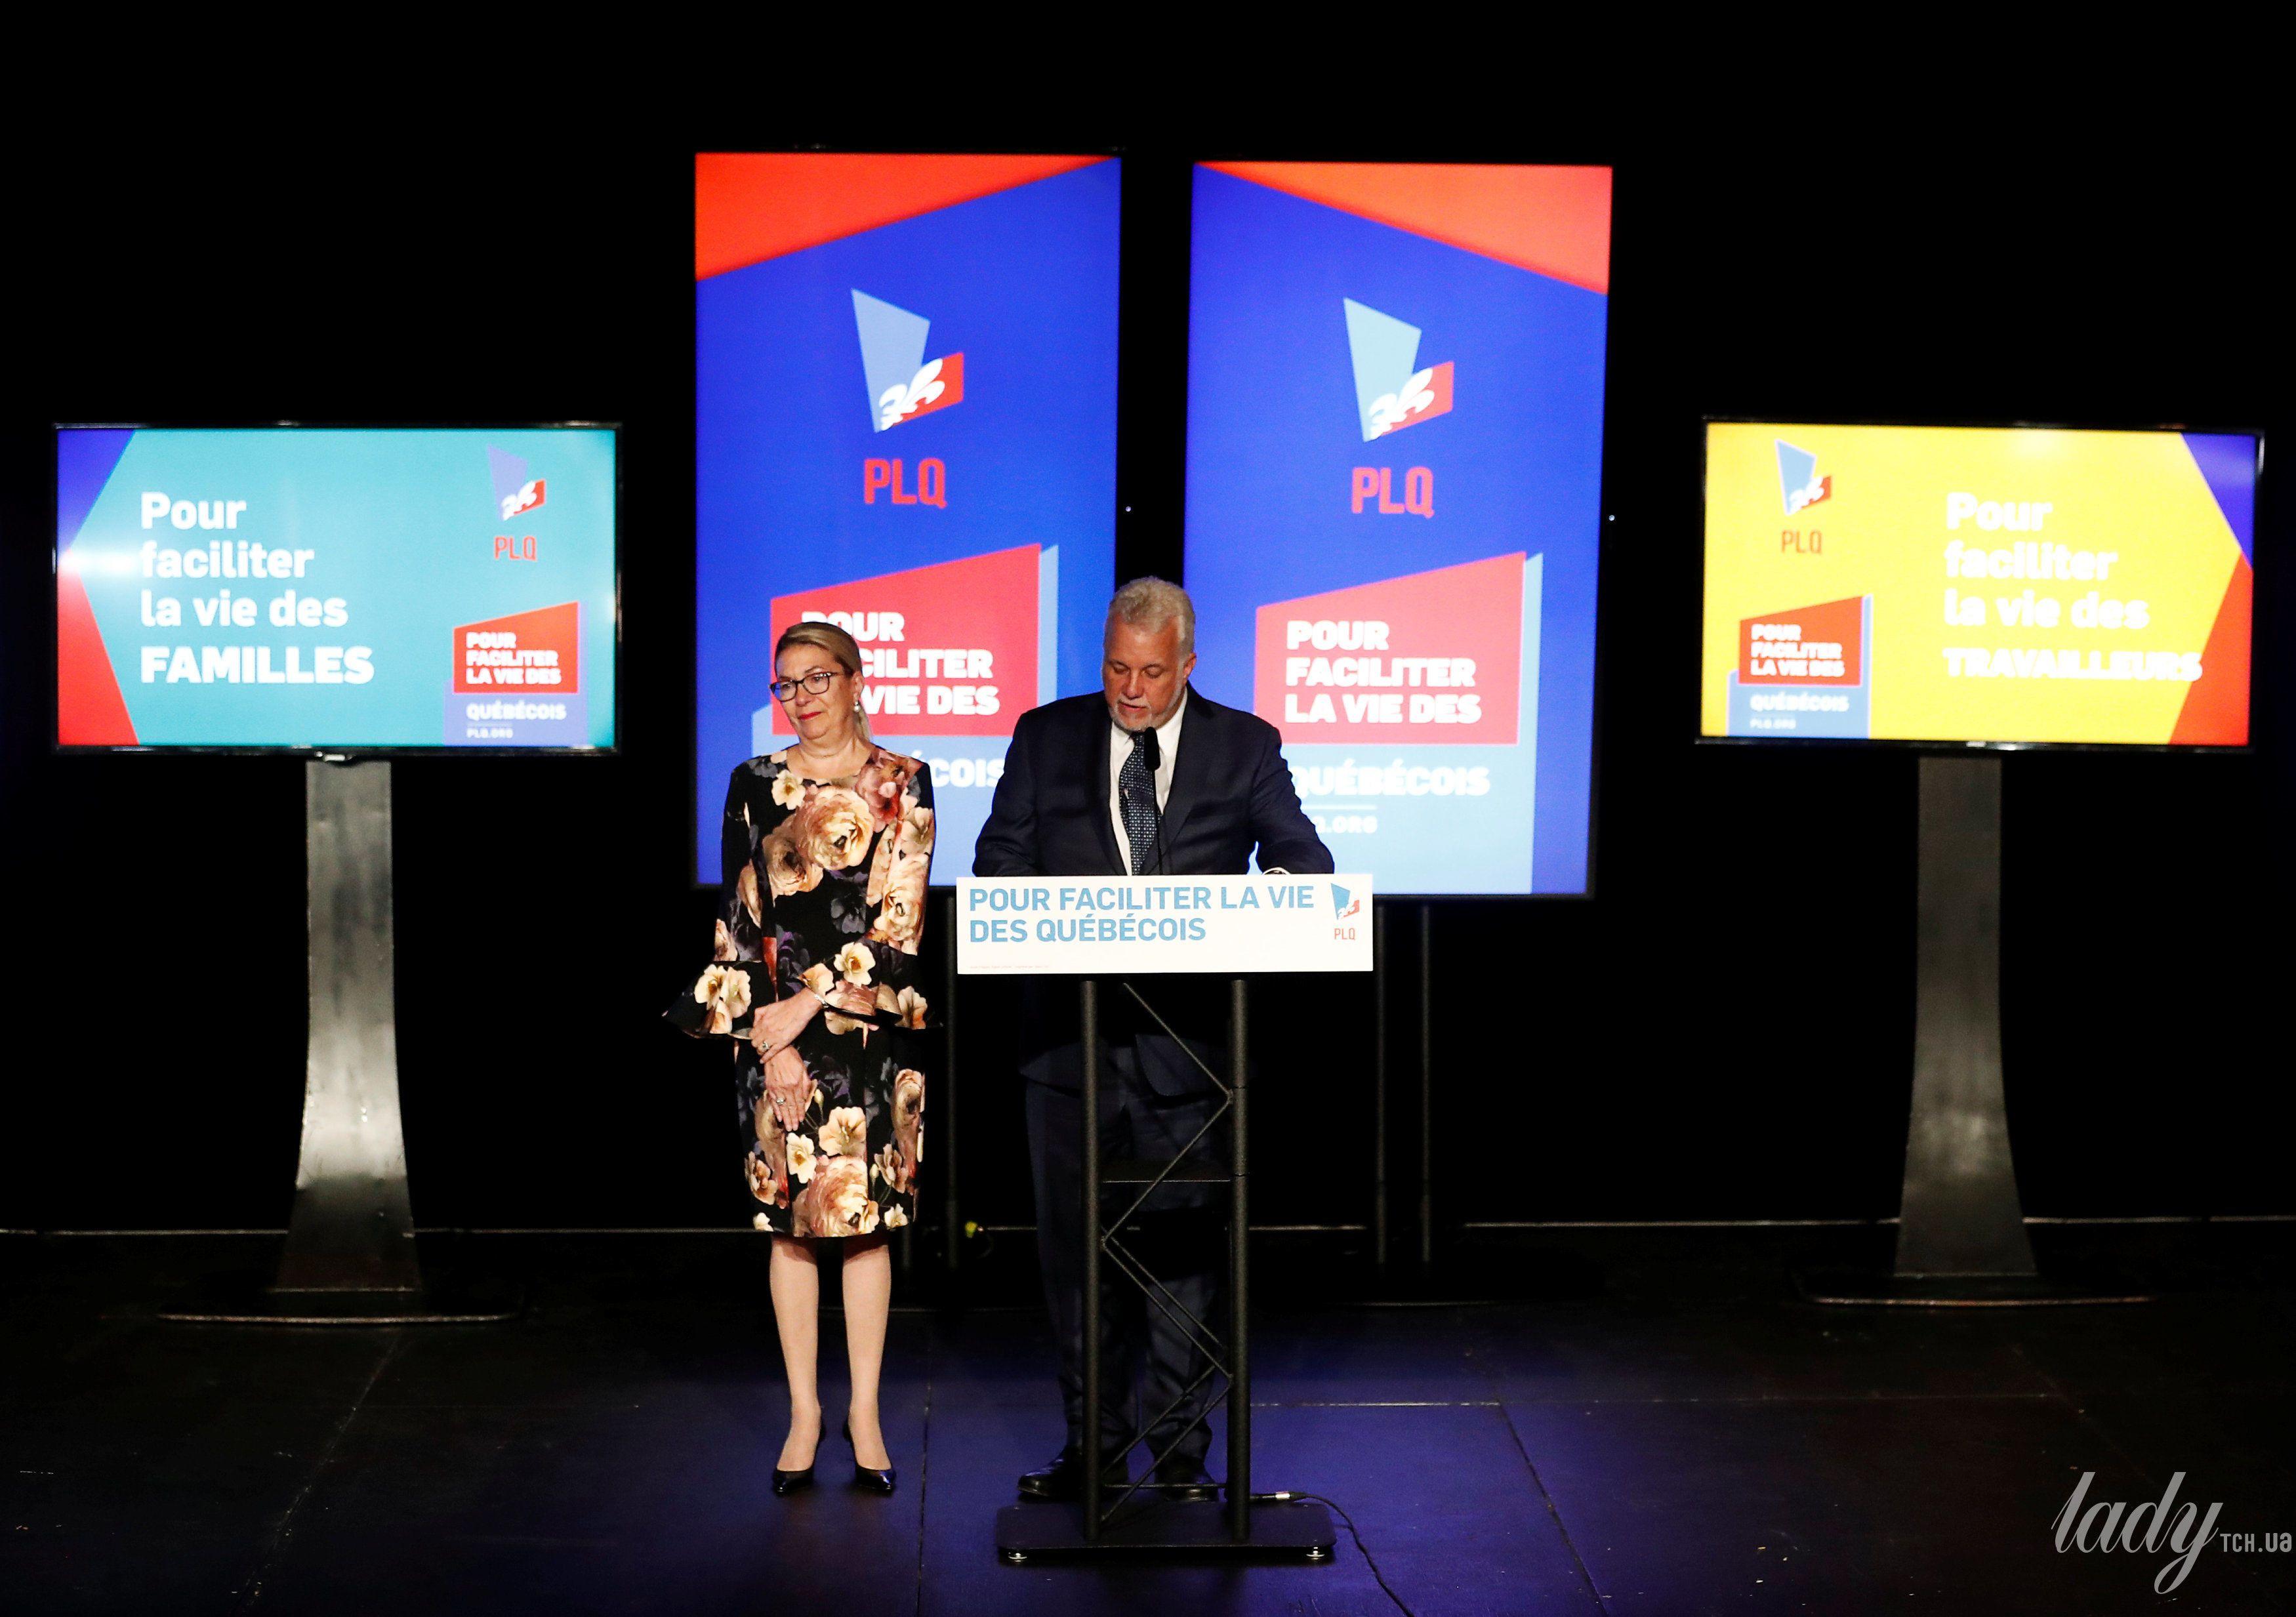 Жена премьер-министра Квебека_2